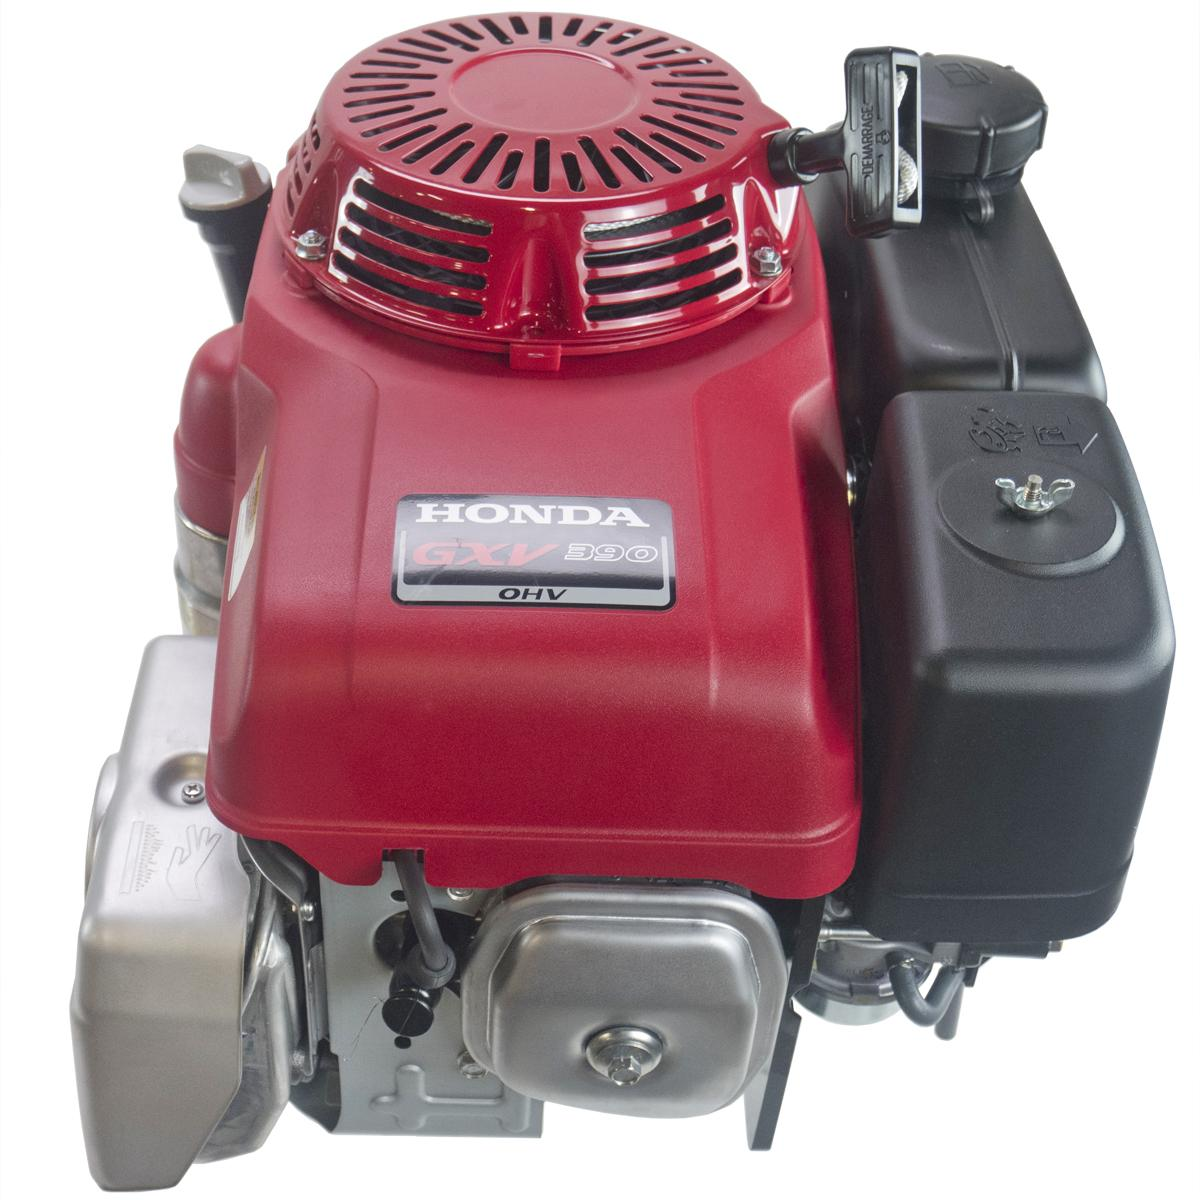 GXV390UT1DE33 Honda GXV390DE33 10.2hp (formerly labeled by Honda as